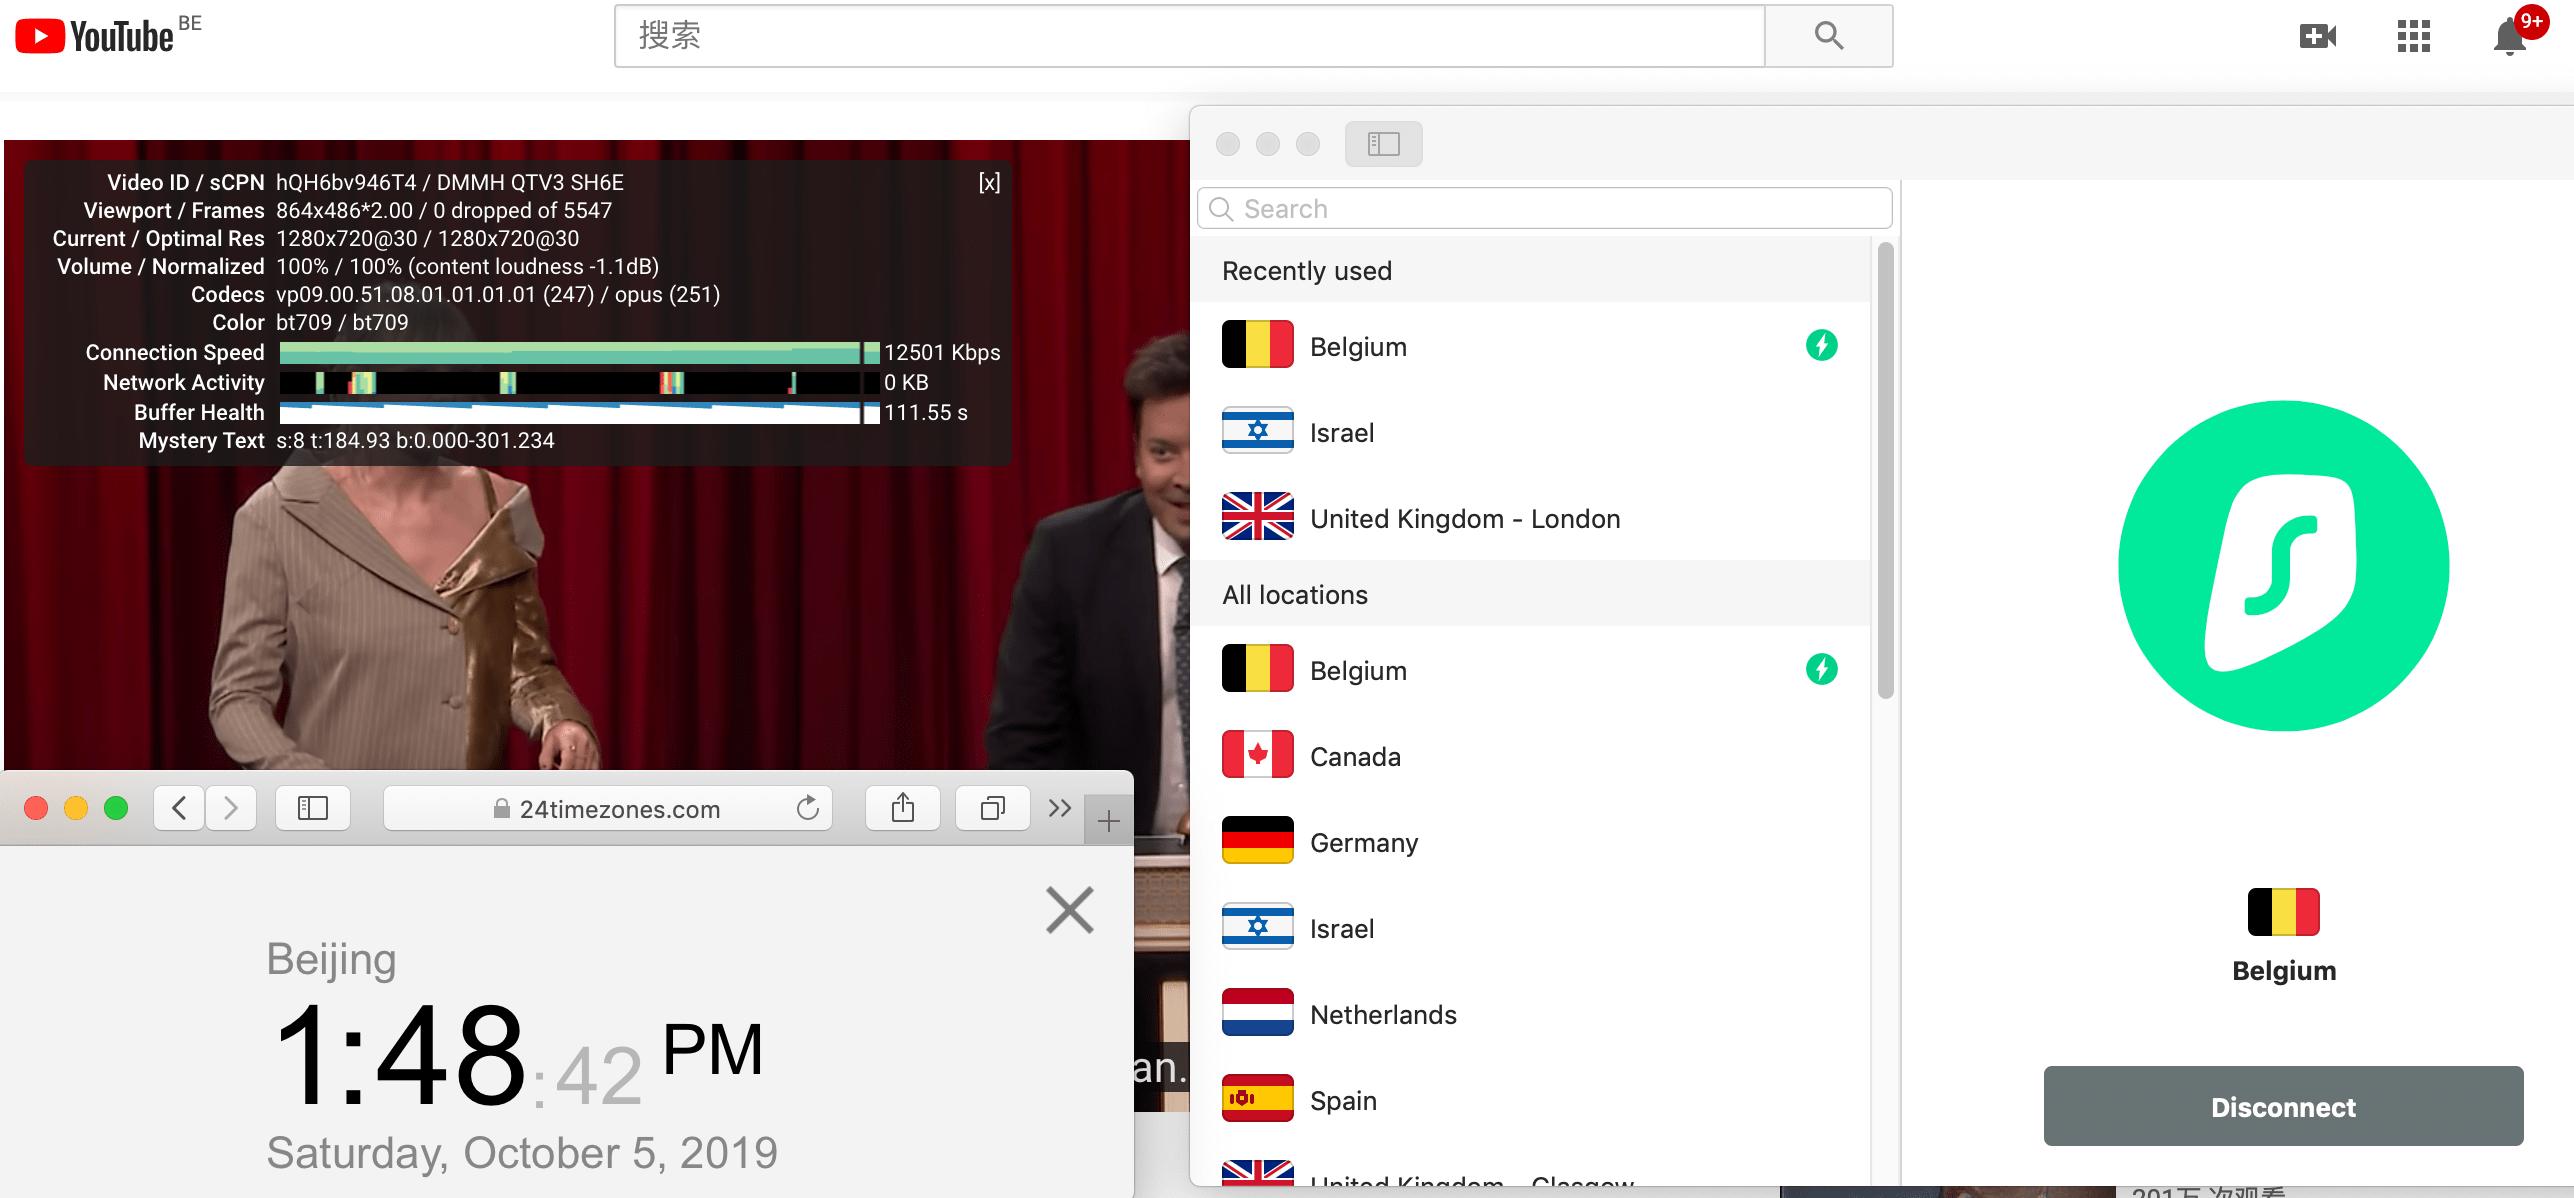 Macbook SurfsharkVPN Belgium YouTube测速 2019-10-05 at 1.48.43 PM